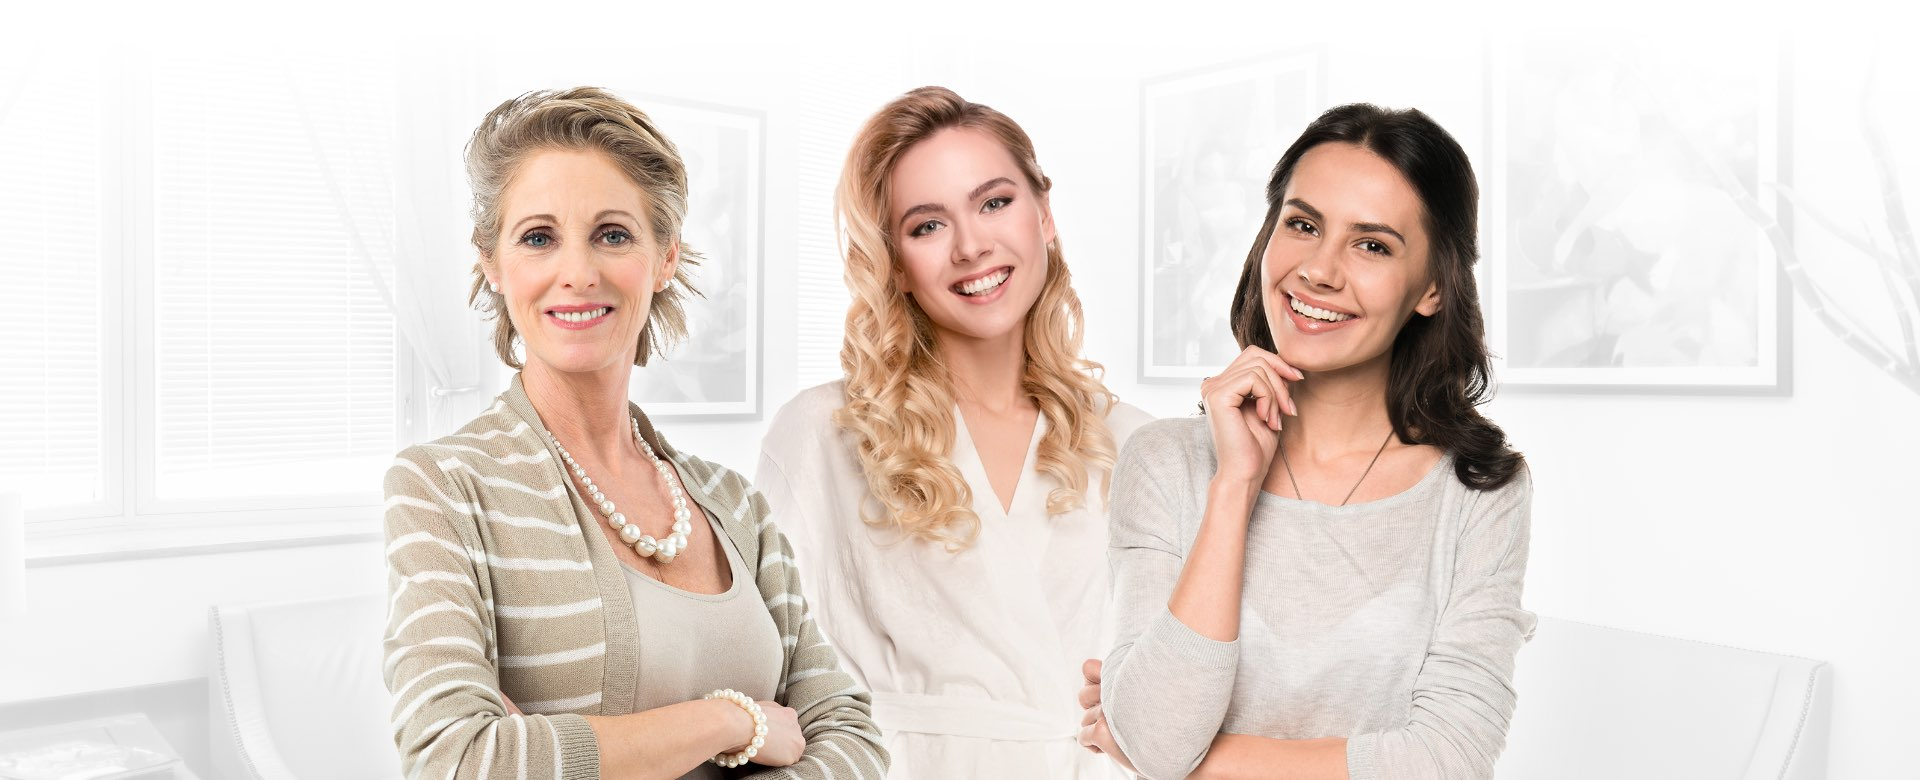 Three women smiling facing forward